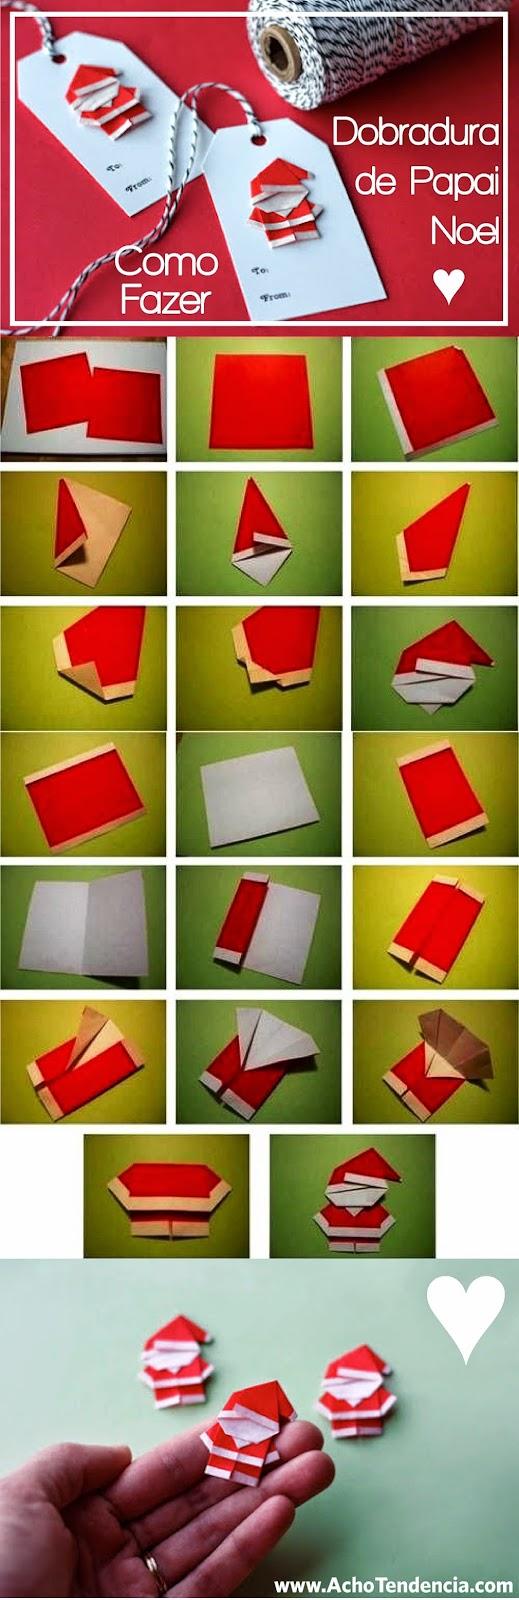 papai noel, origami, dobradura, como fazer, ideias, natal, diy